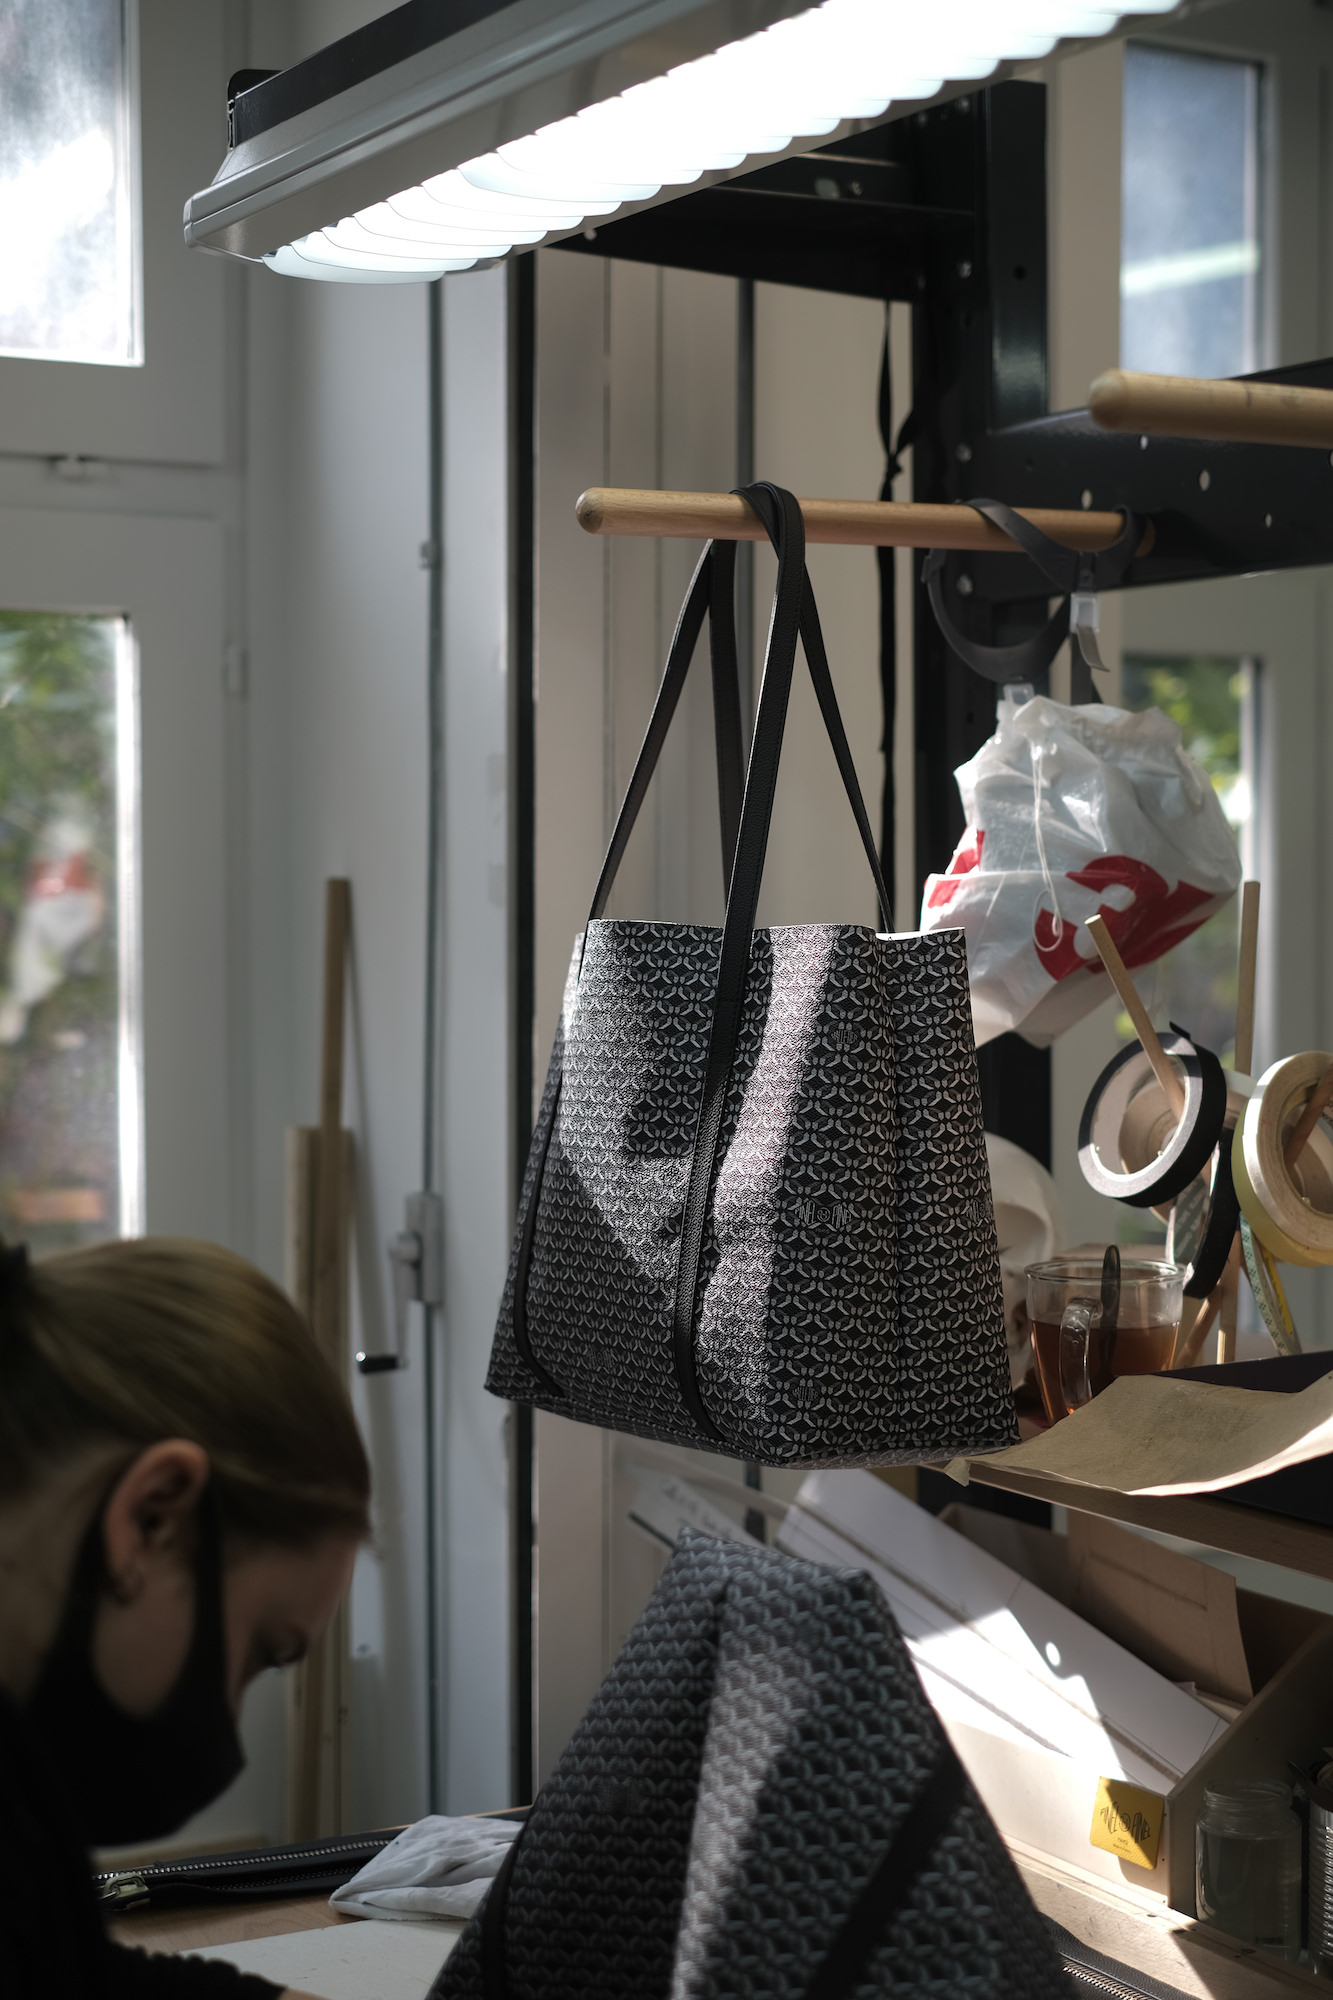 pinel pinel sac